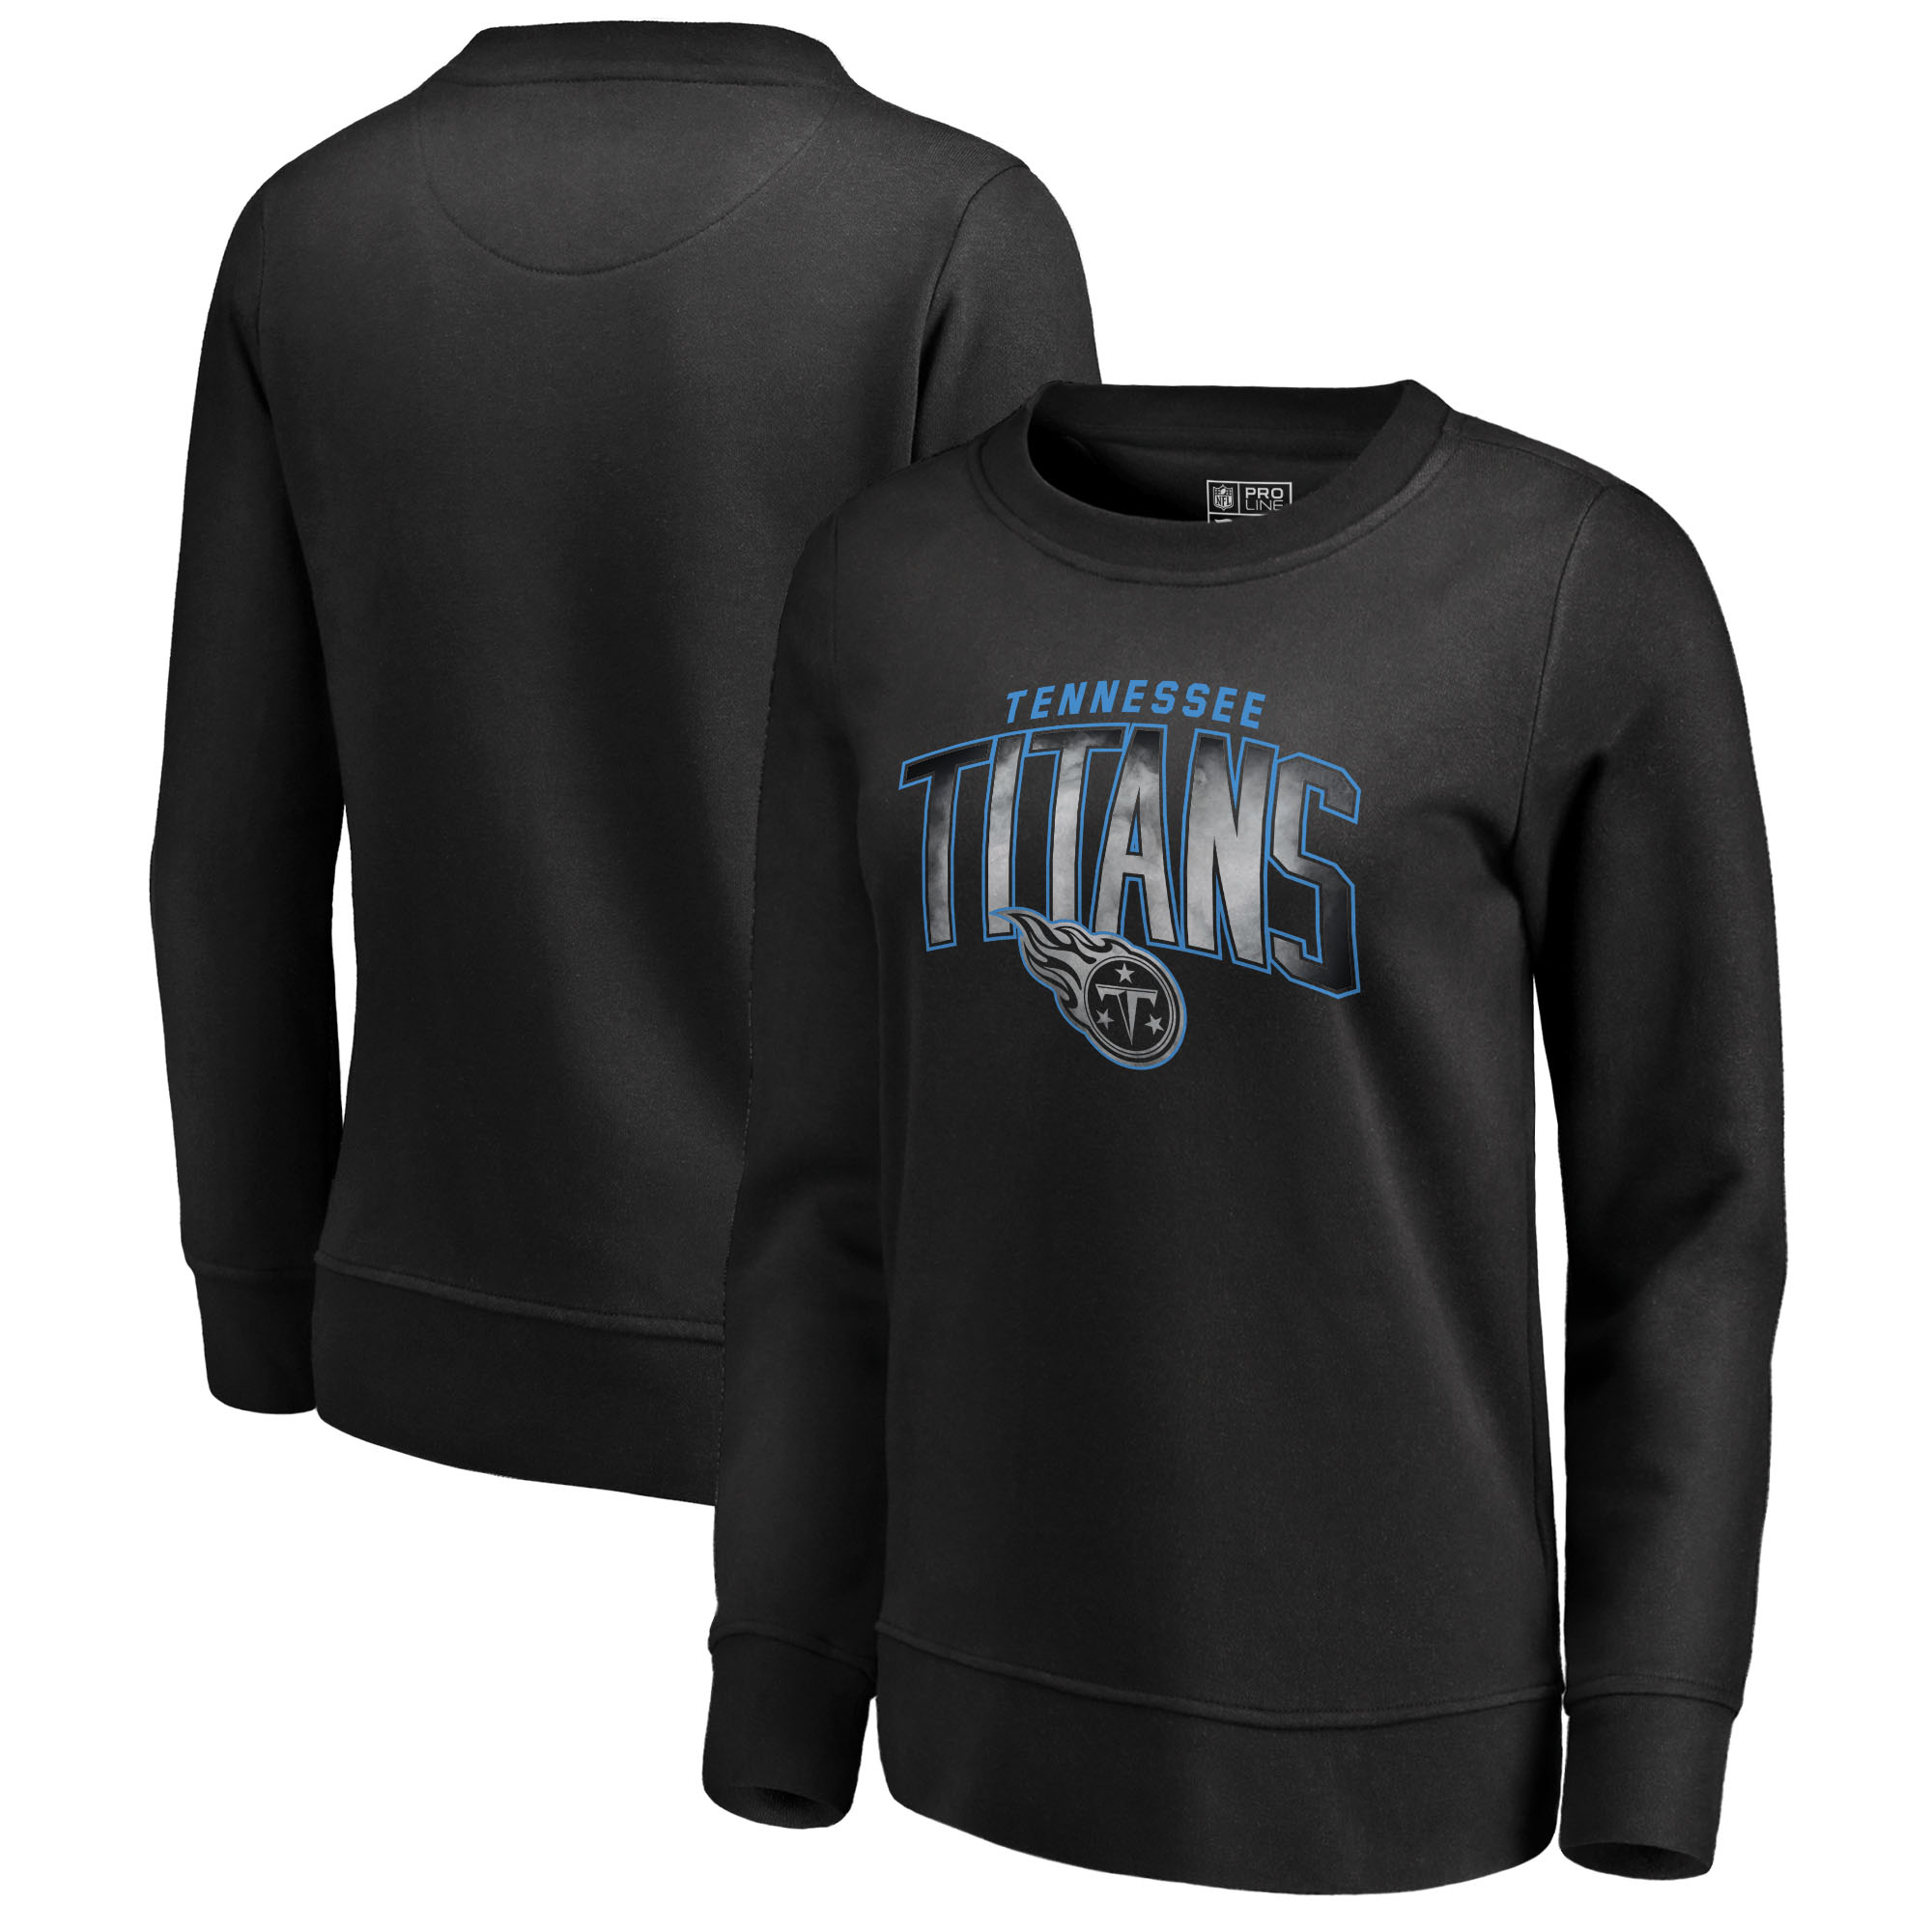 Tennessee Titans NFL Pro Line by Fanatics Branded Women's Arch Smoke Crew Neck Fleece Sweatshirt - Black